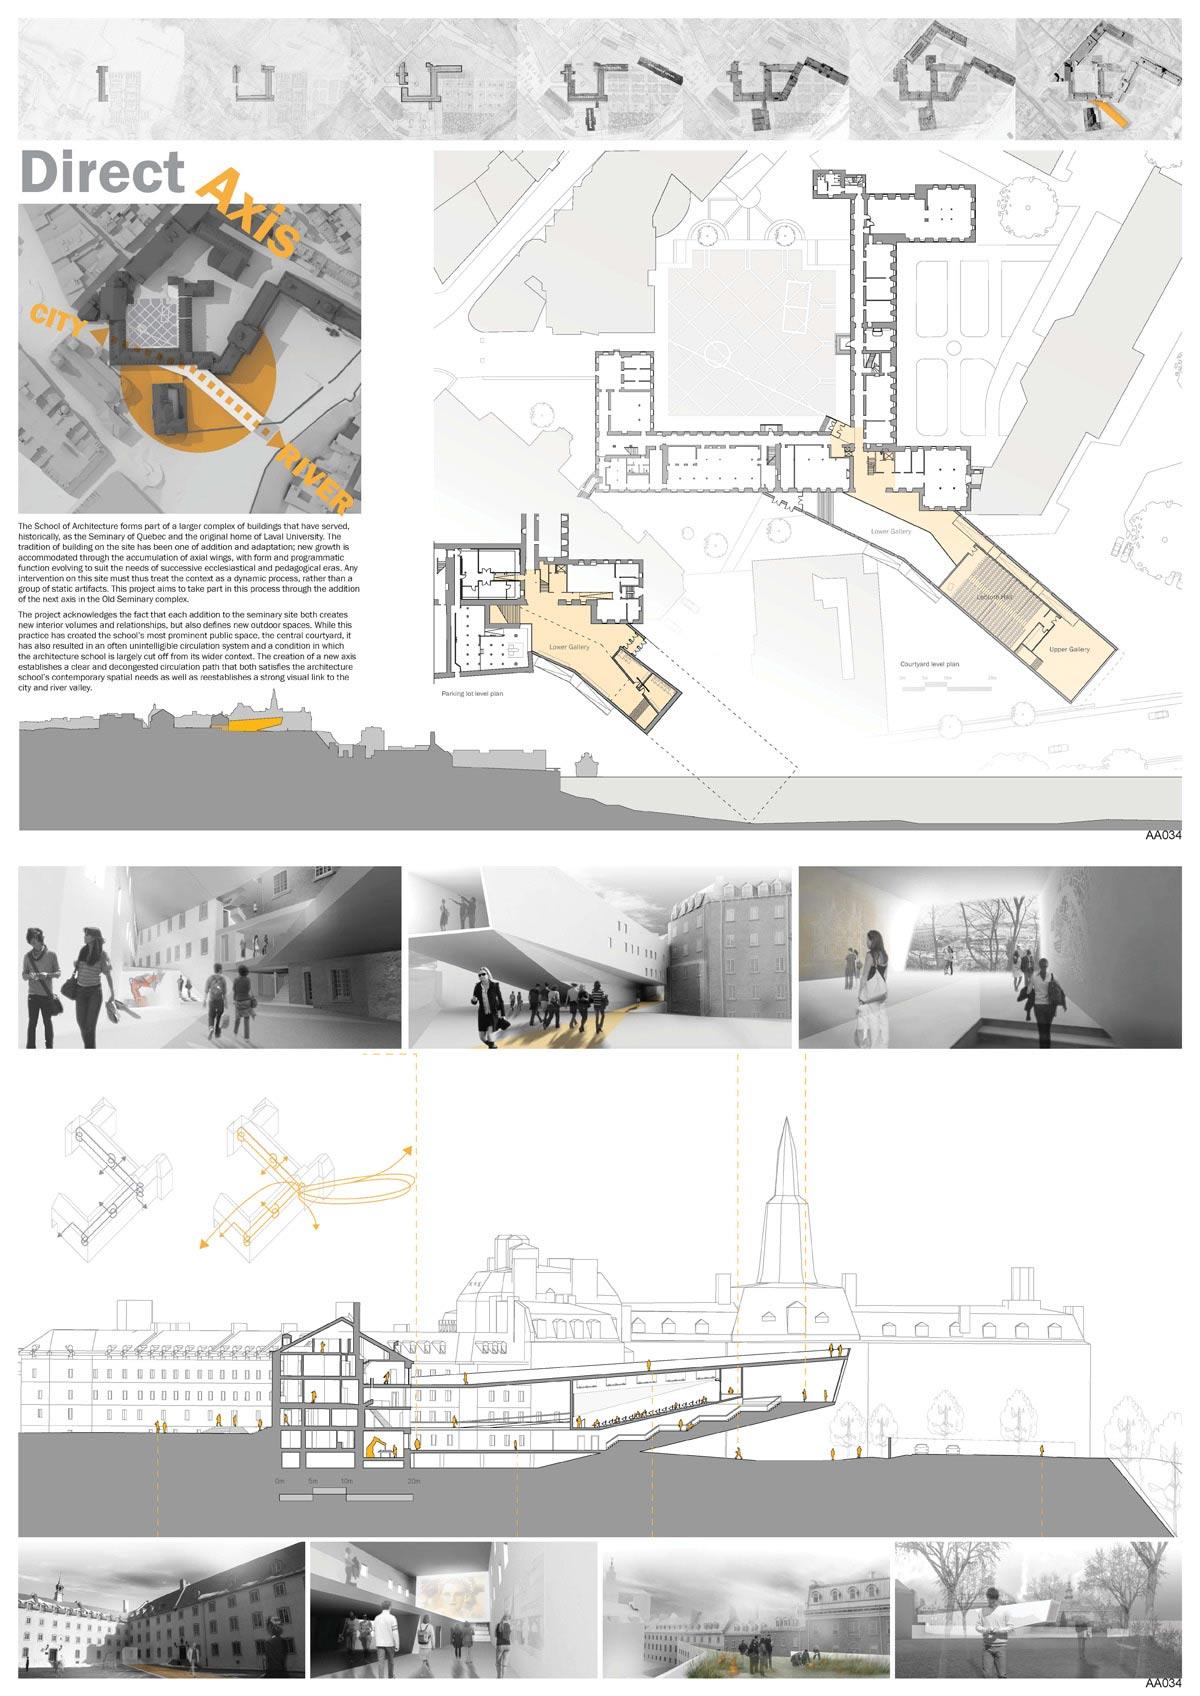 Direct Axis (University of Toronto, Toronto, Canada), par 1er prix ex aequo - Omar Aljebouri, Avery Guthrie, Steve Socha (Étudiants)